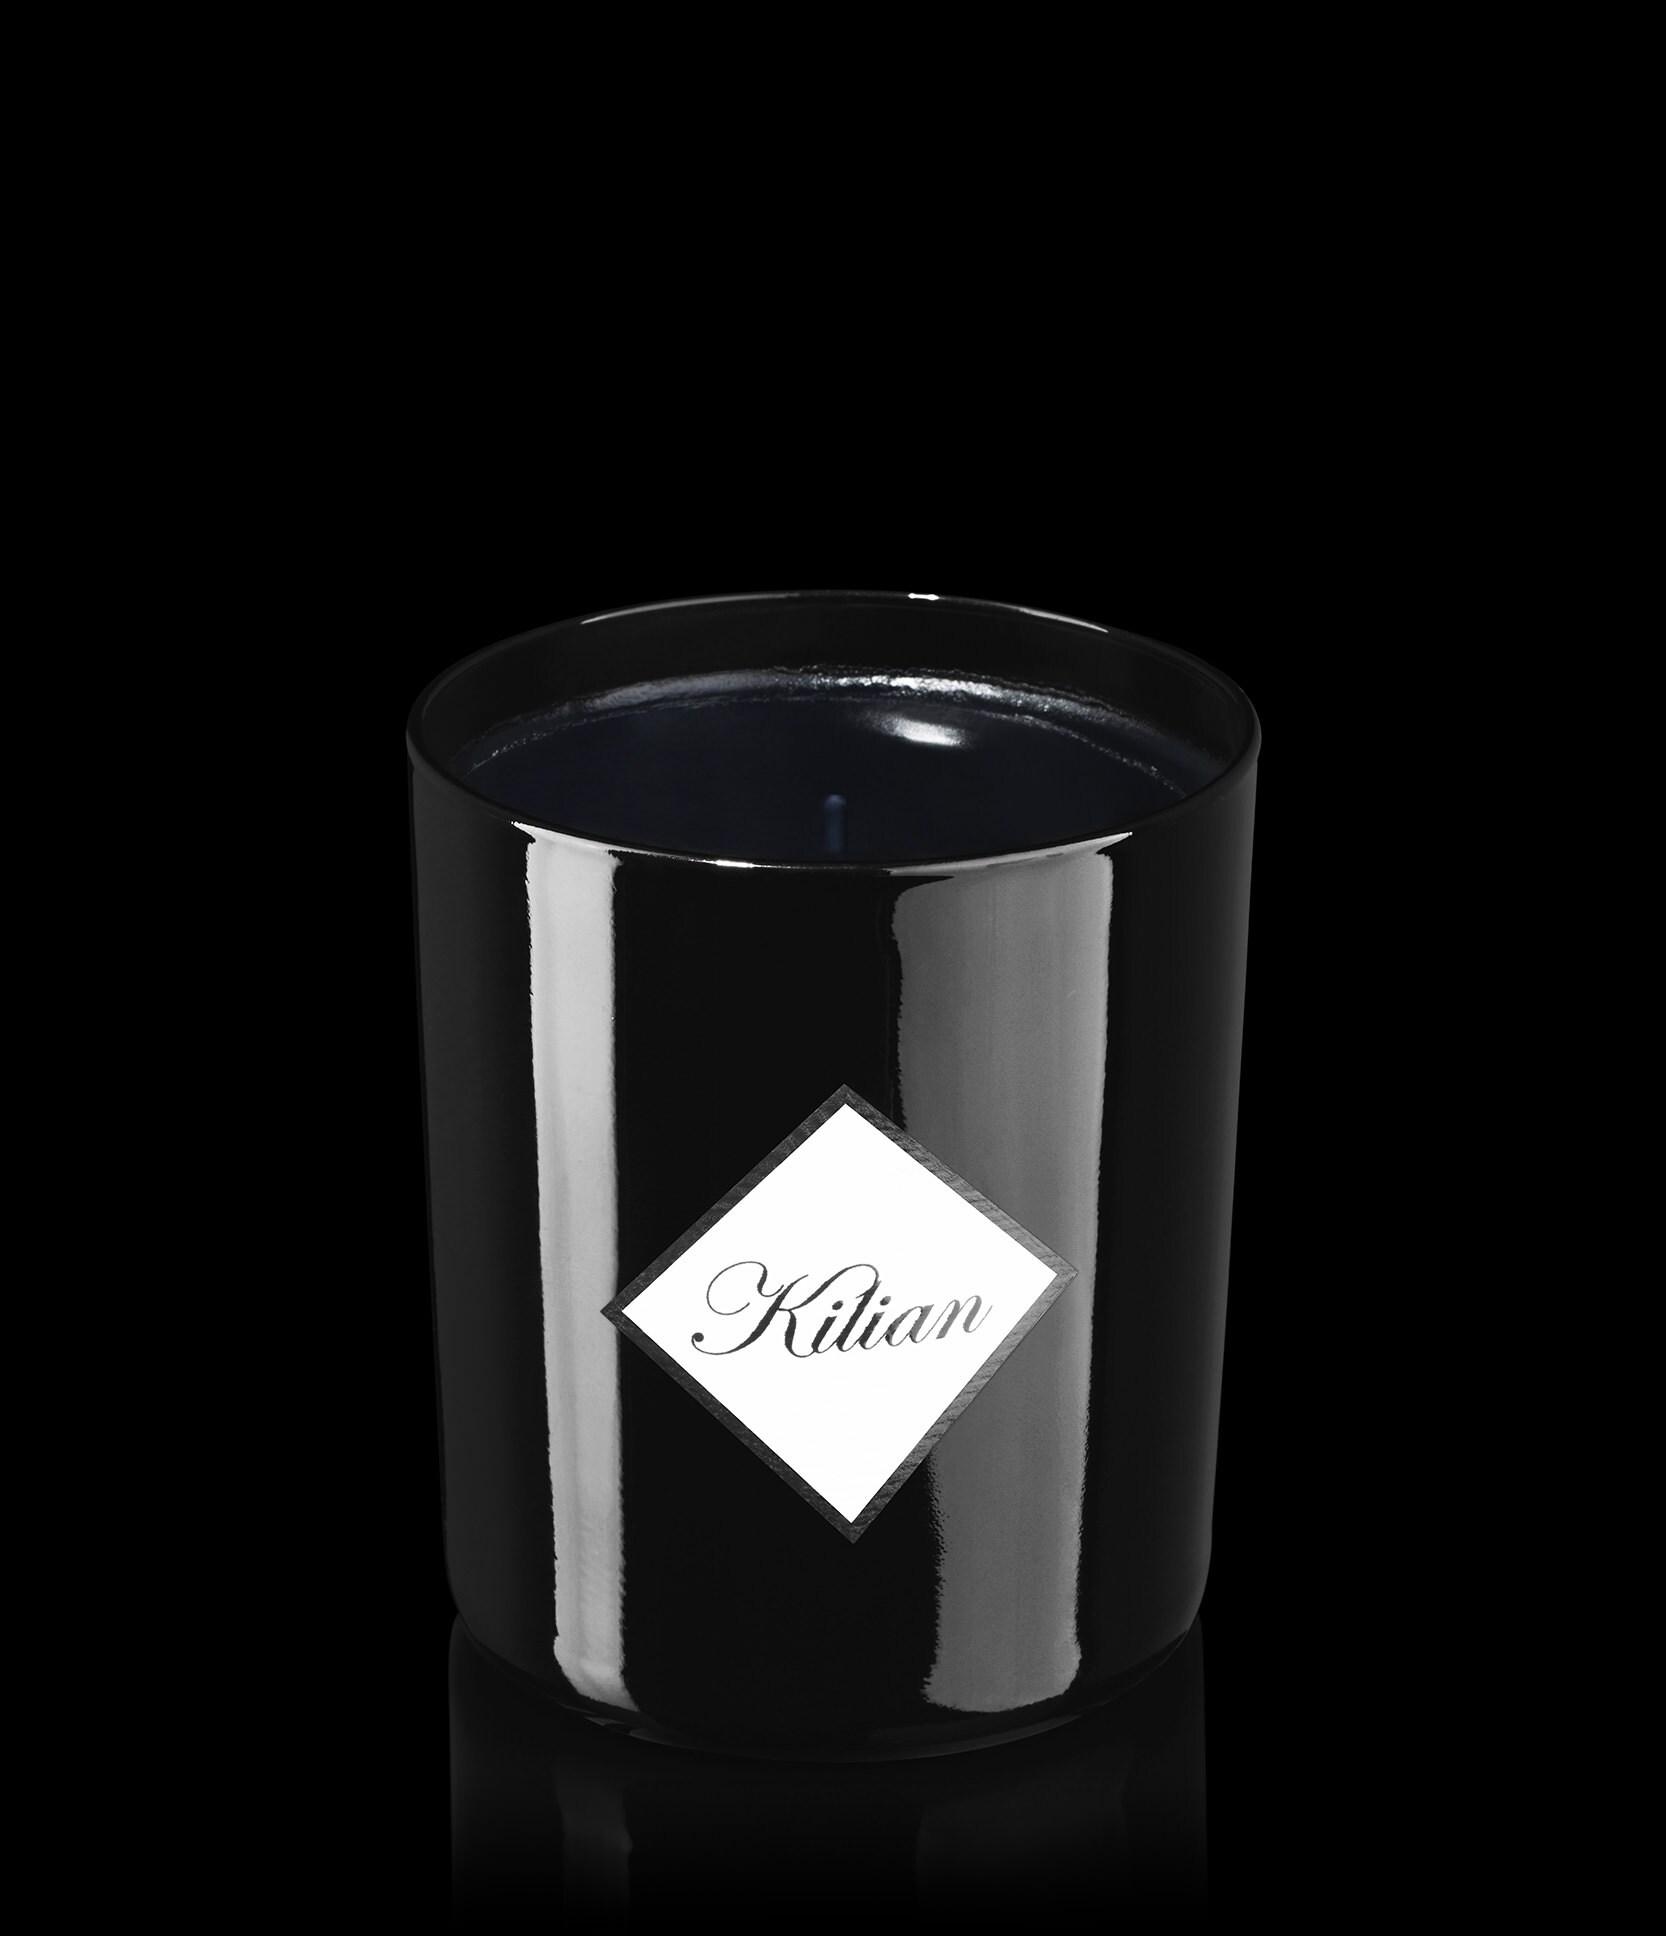 noir ottoman candles kilian. Black Bedroom Furniture Sets. Home Design Ideas